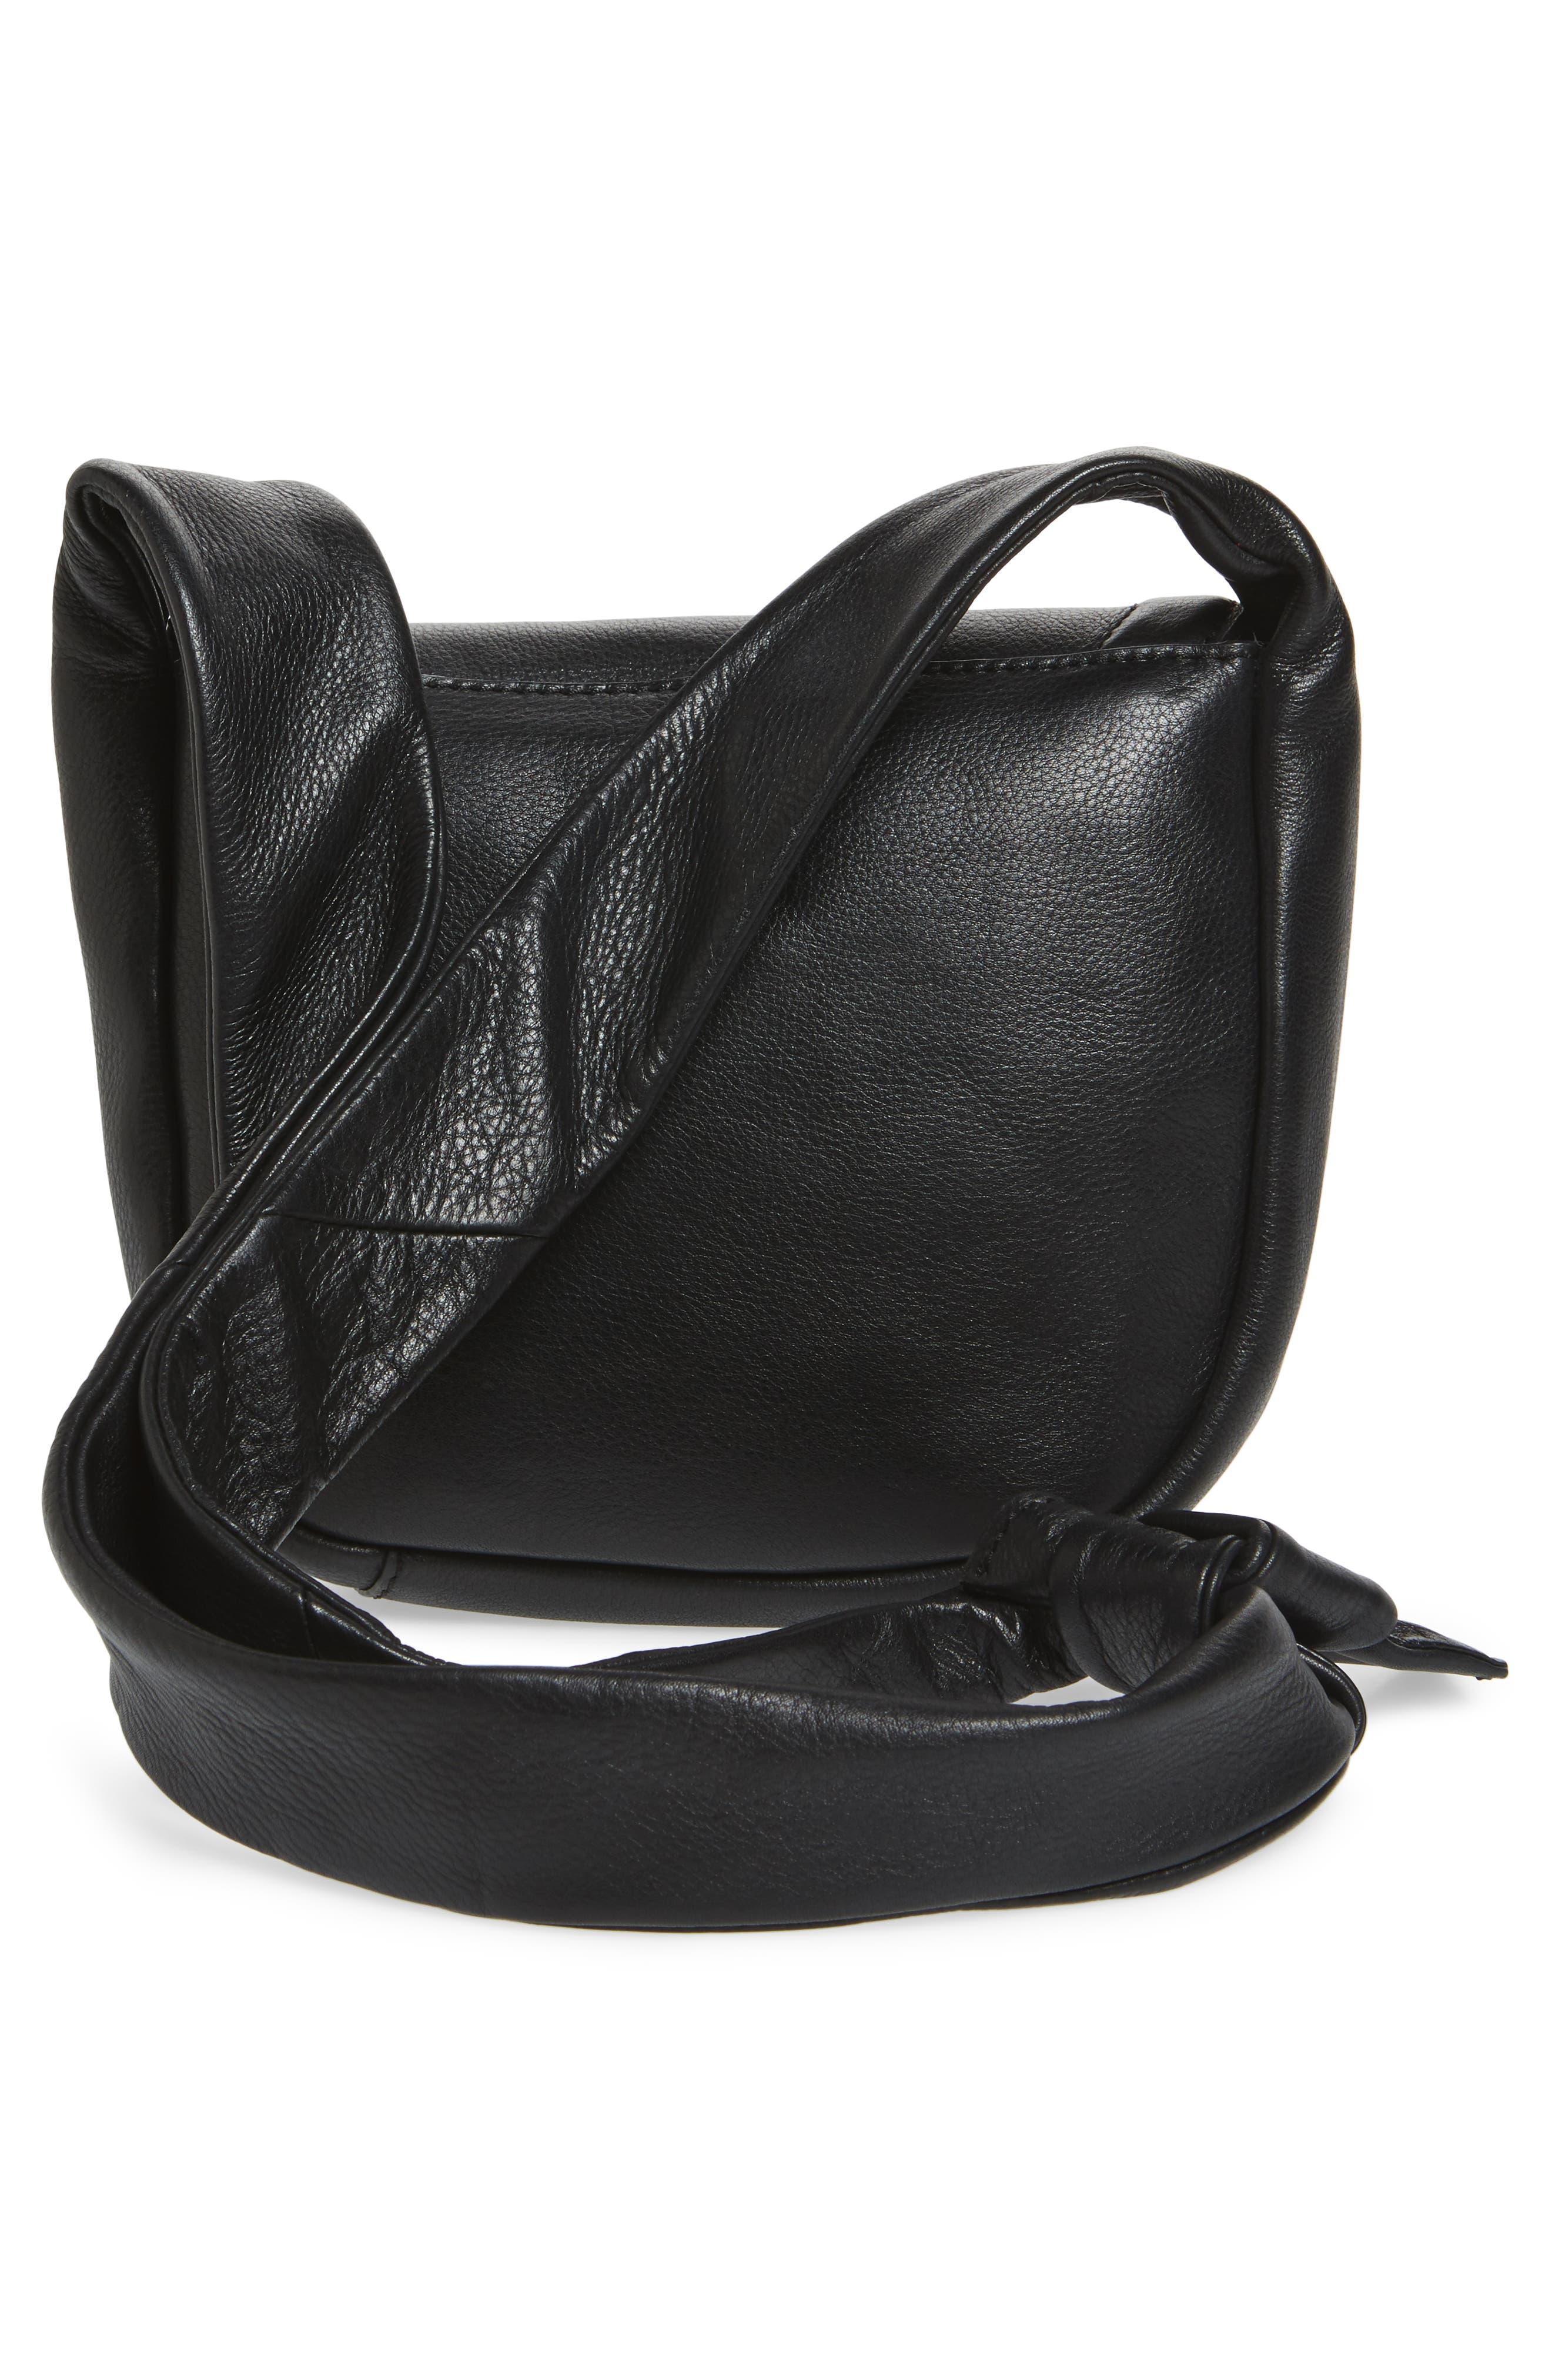 Jasmine Leather Saddle Bag,                             Alternate thumbnail 3, color,                             001